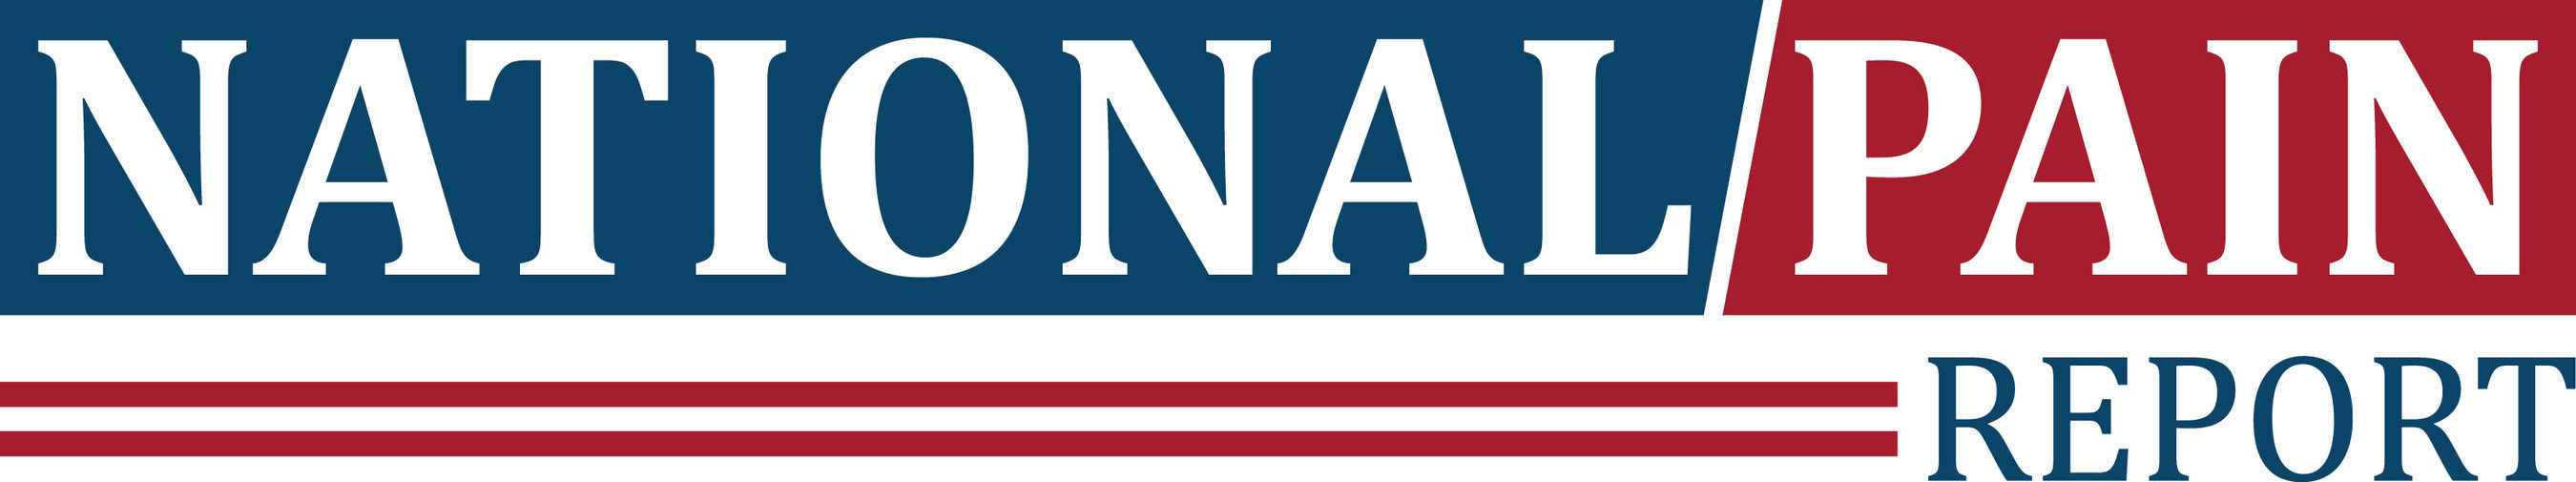 National Pain Report logo (PRNewsFoto/National Pain Report)